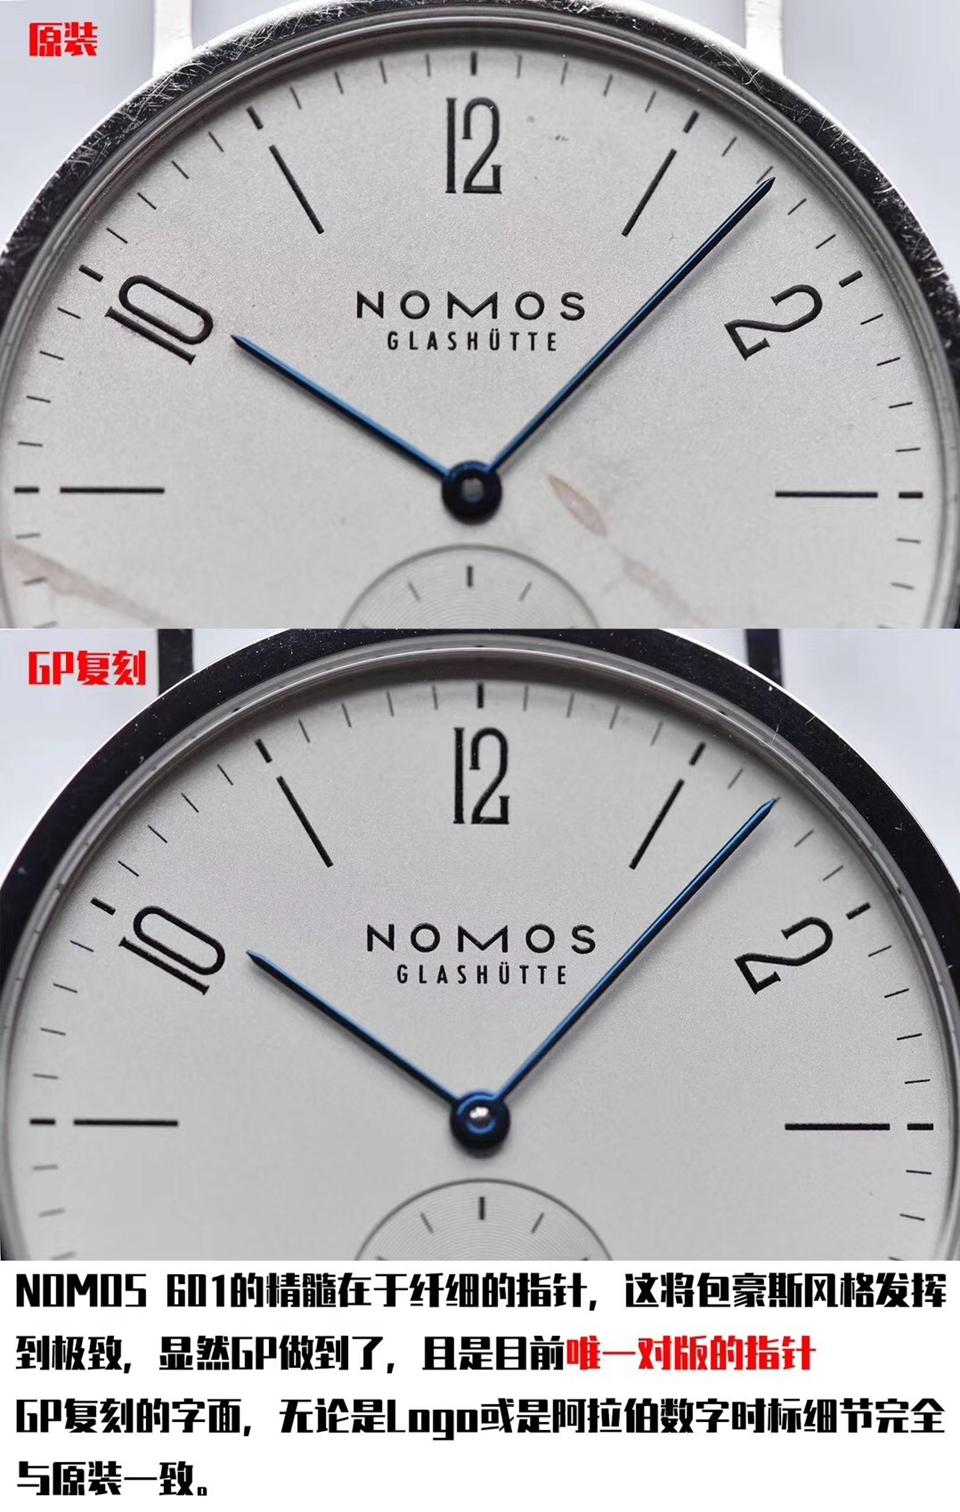 GP诺莫斯TANGOMAT系列601腕表真假评测